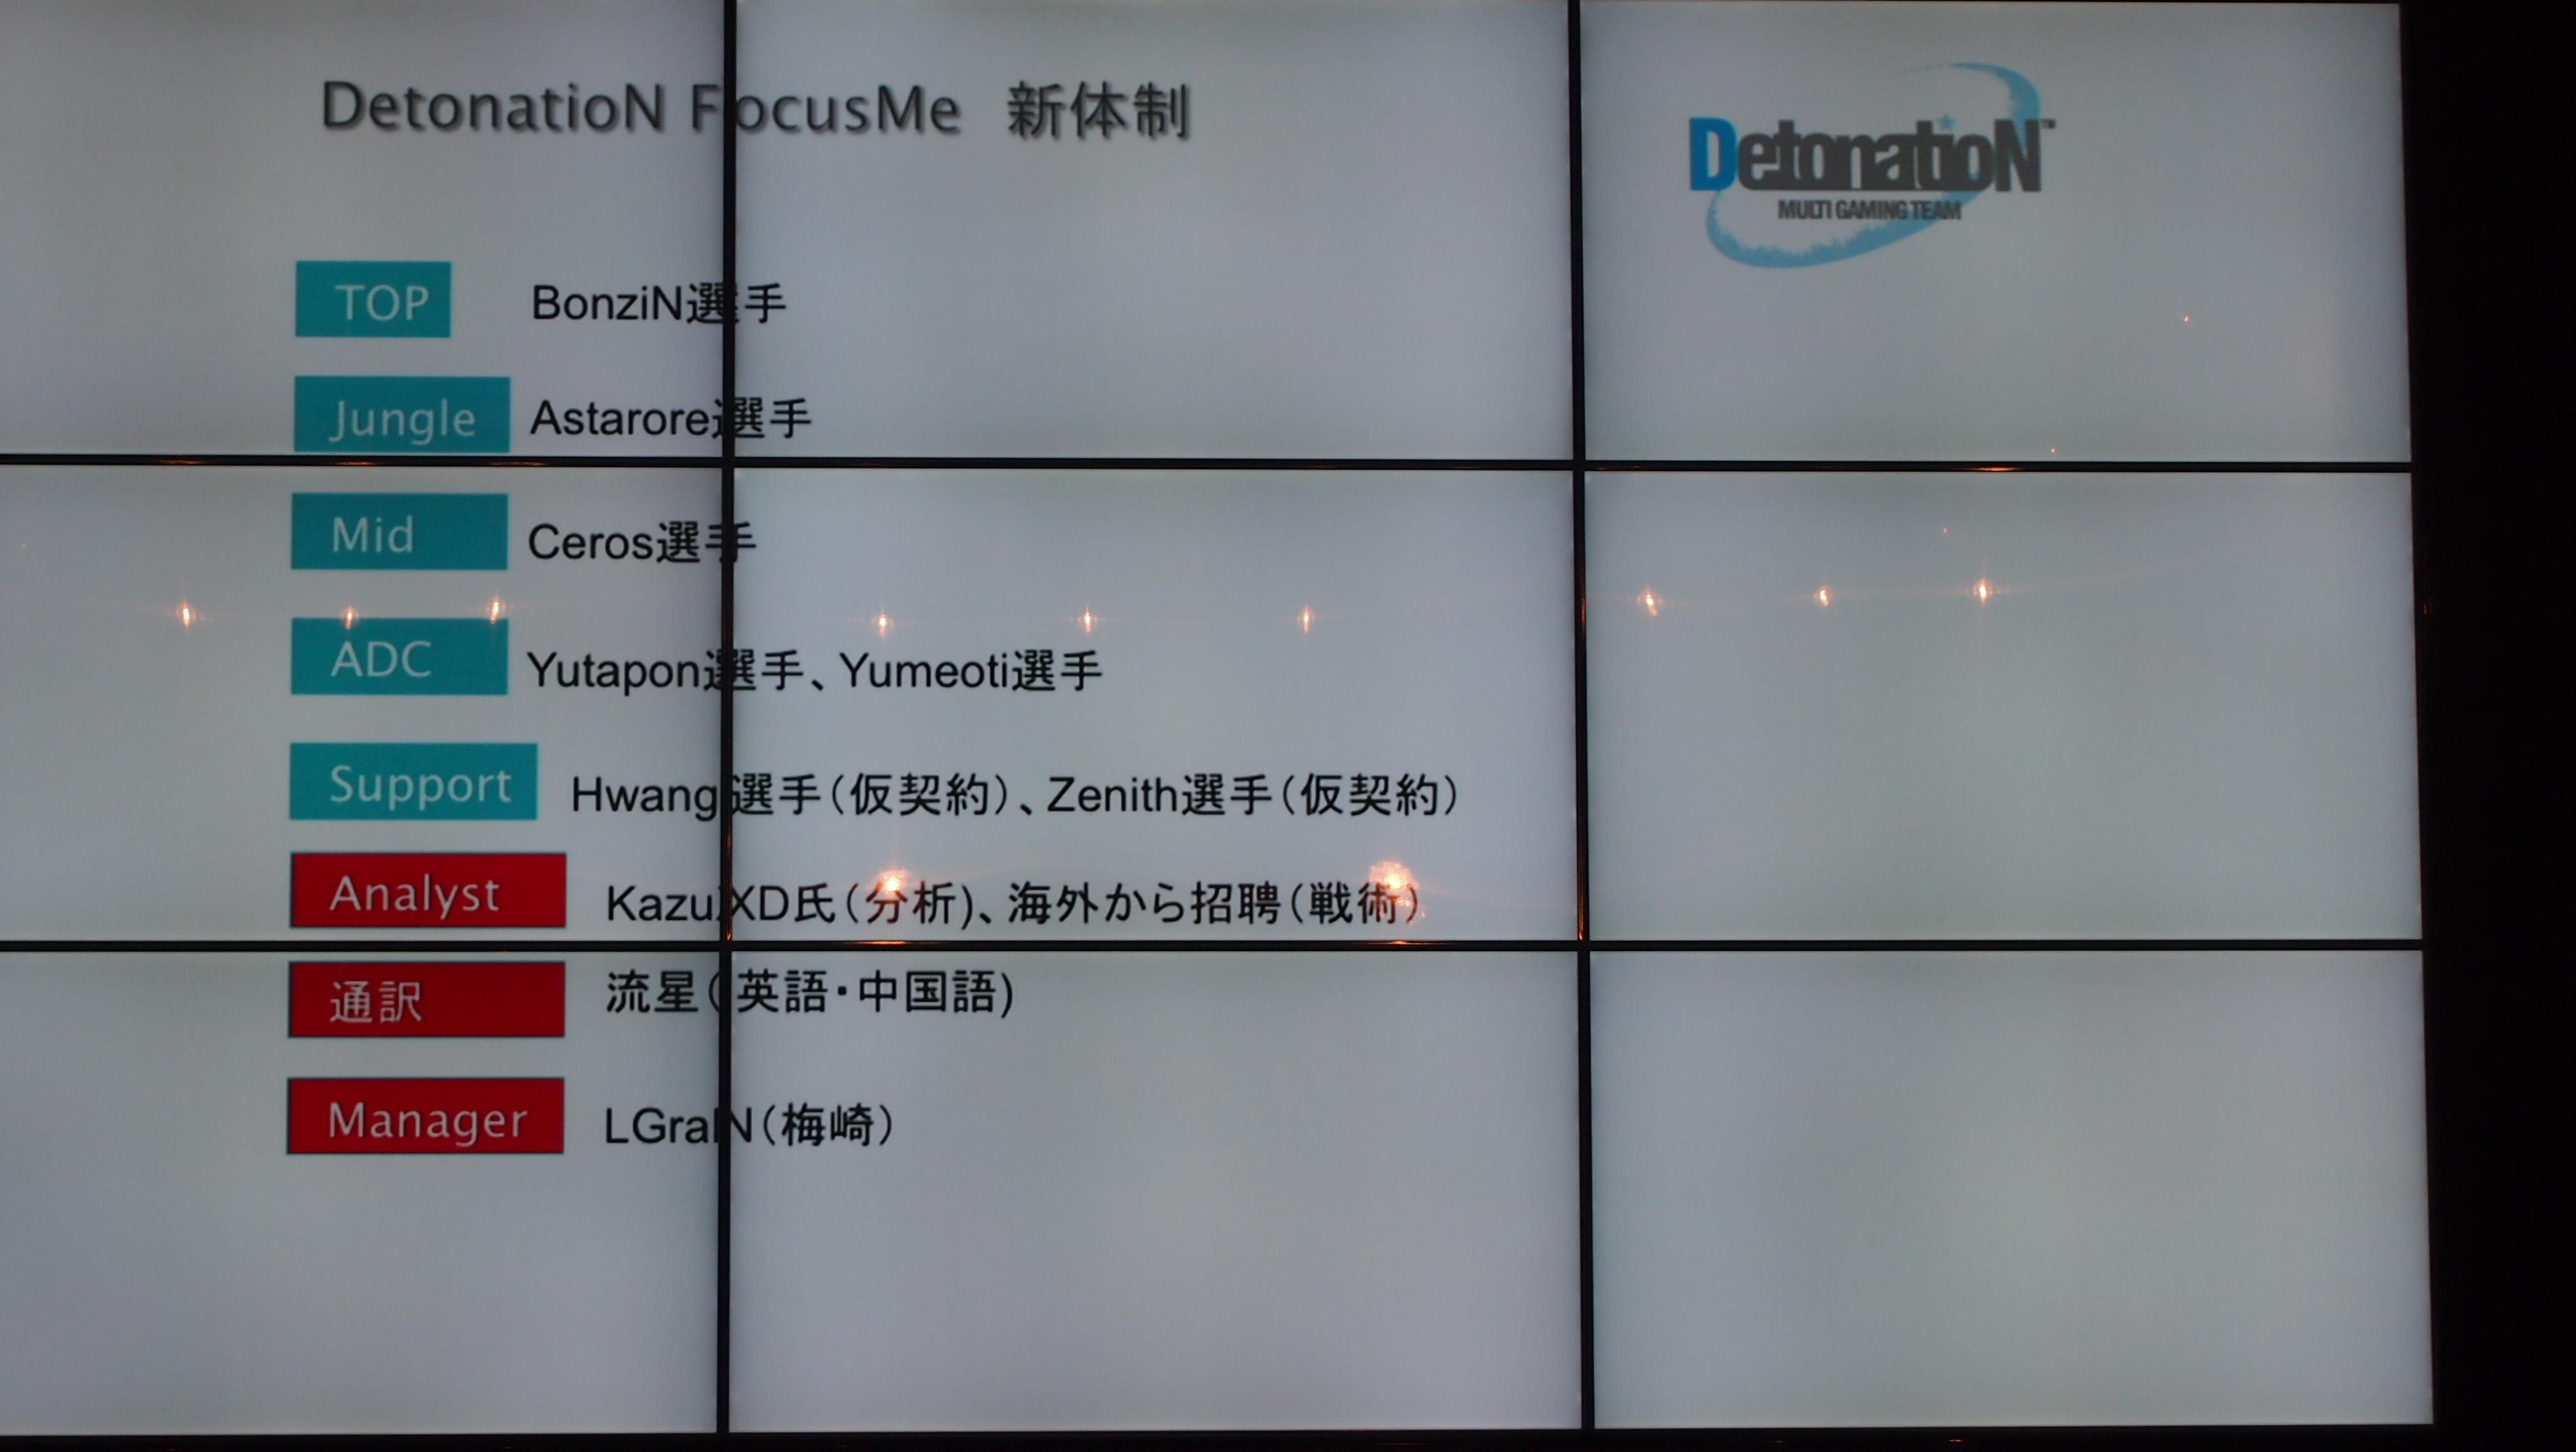 DetonatioN FMの新体制